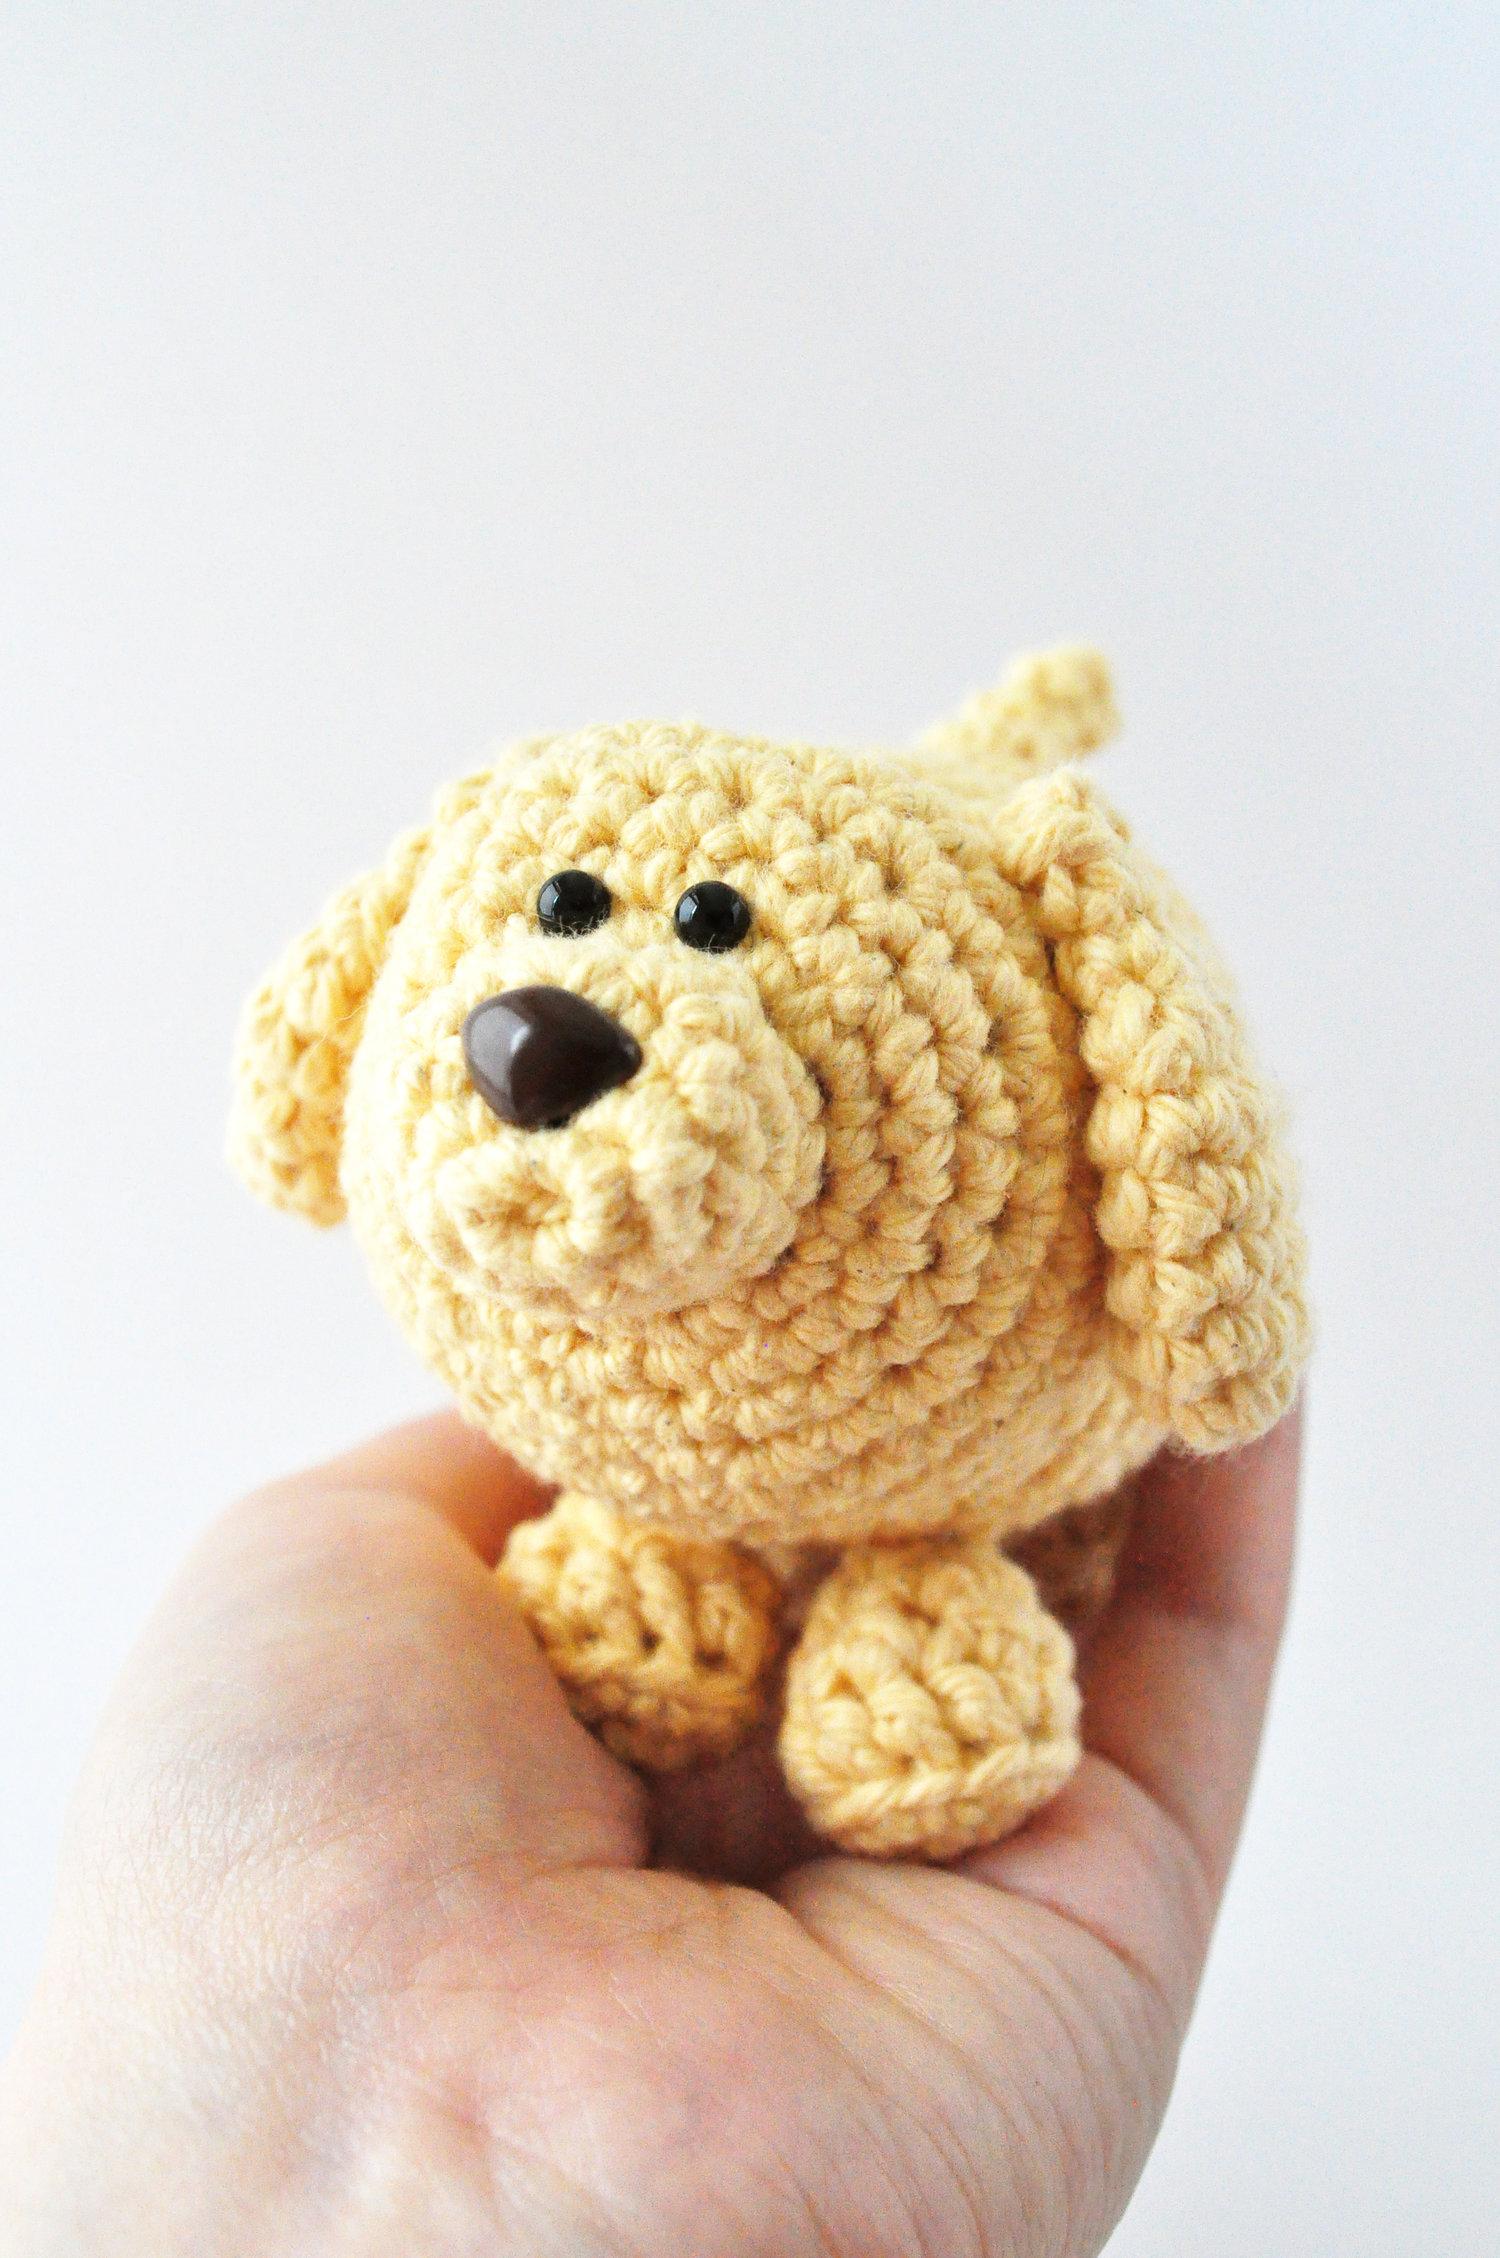 Dog Crochet Pattern The Pudgy Rabbit